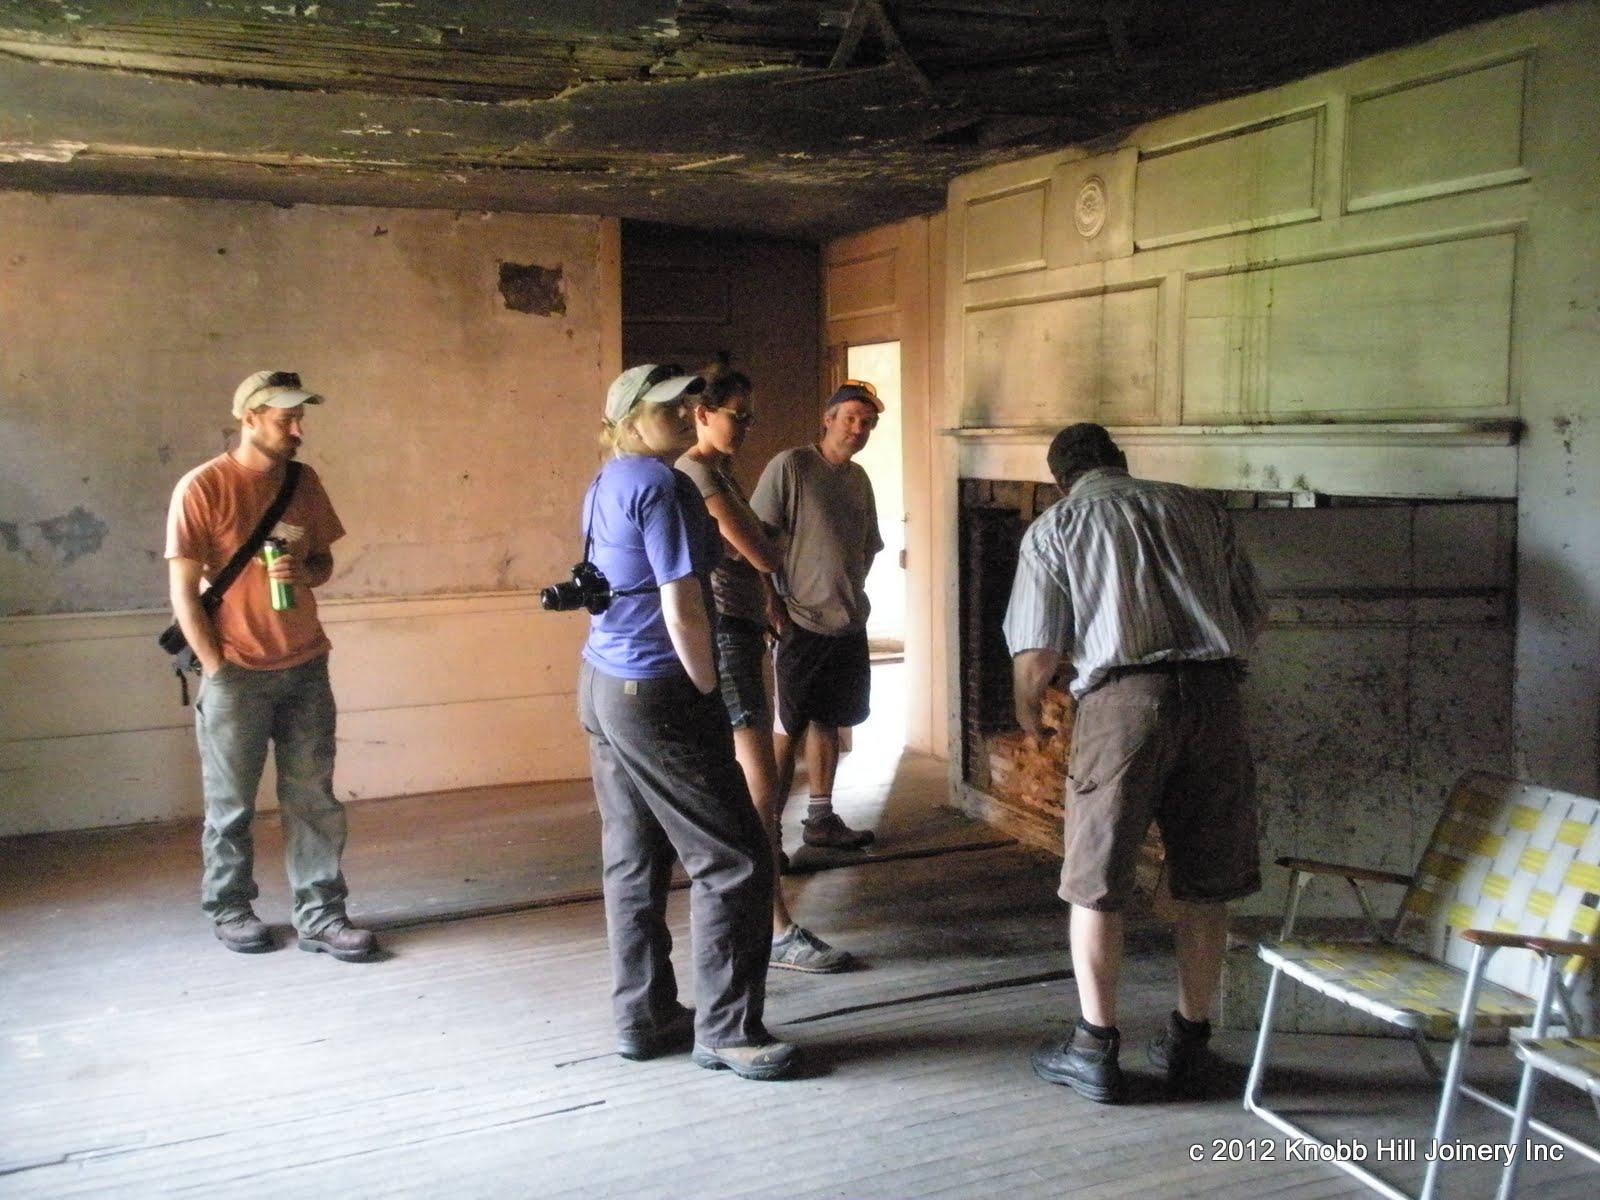 Jamie Duggan explains historic masonry at the Theron Boyd House.